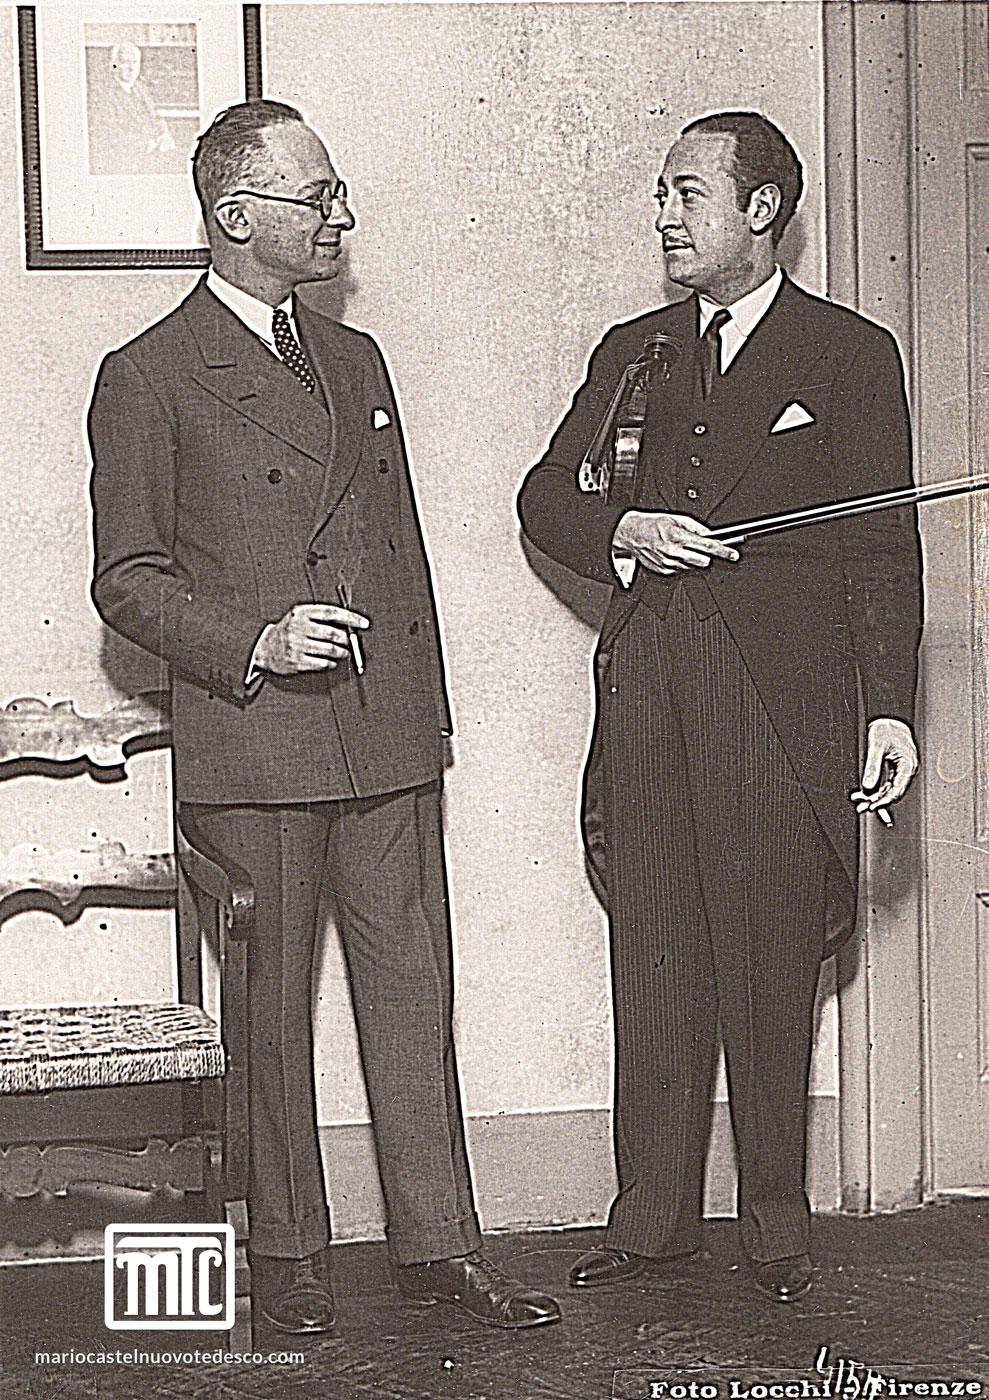 MCT with Jascha Heifetz, Florence, 1934